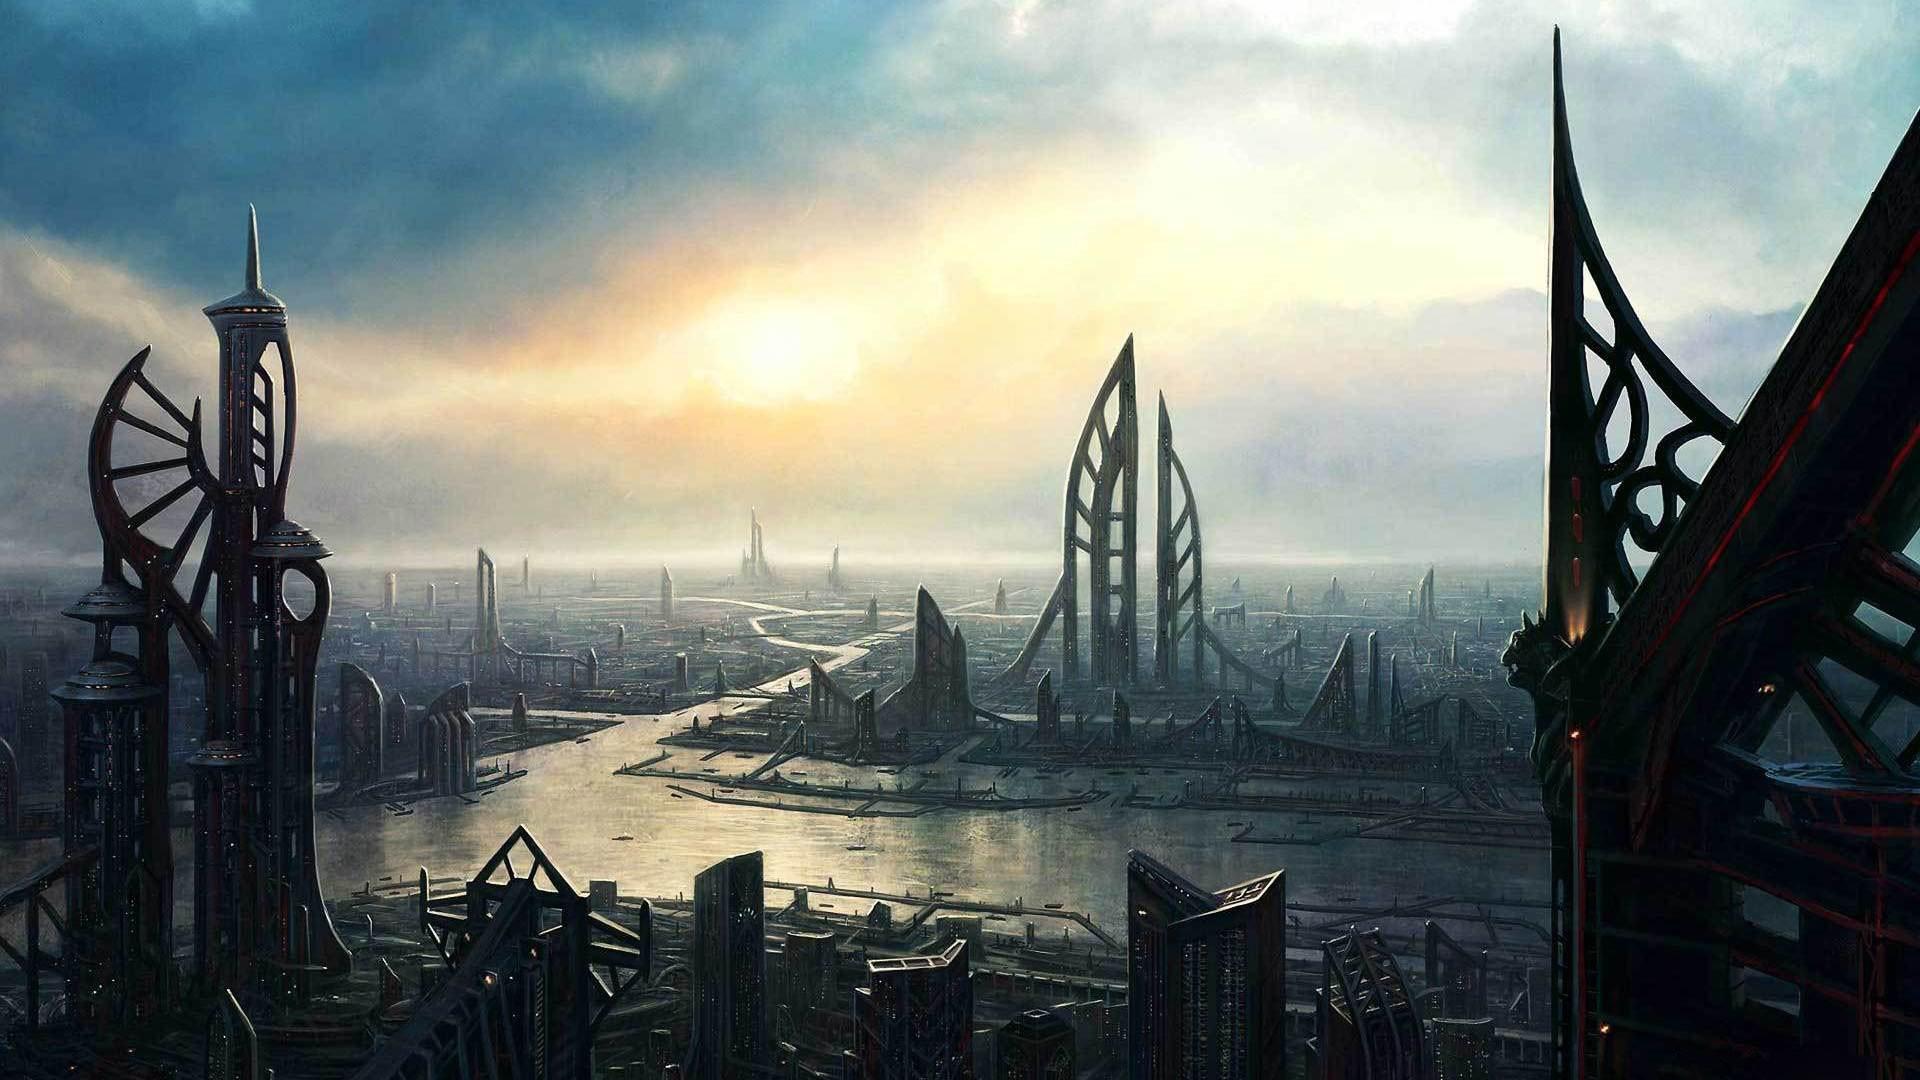 https://newevolutiondesigns.com/images/freebies/futuristic-city-wallpaper-40.jpg  | // World // Sci-Fi | Pinterest | Environment concept art, …